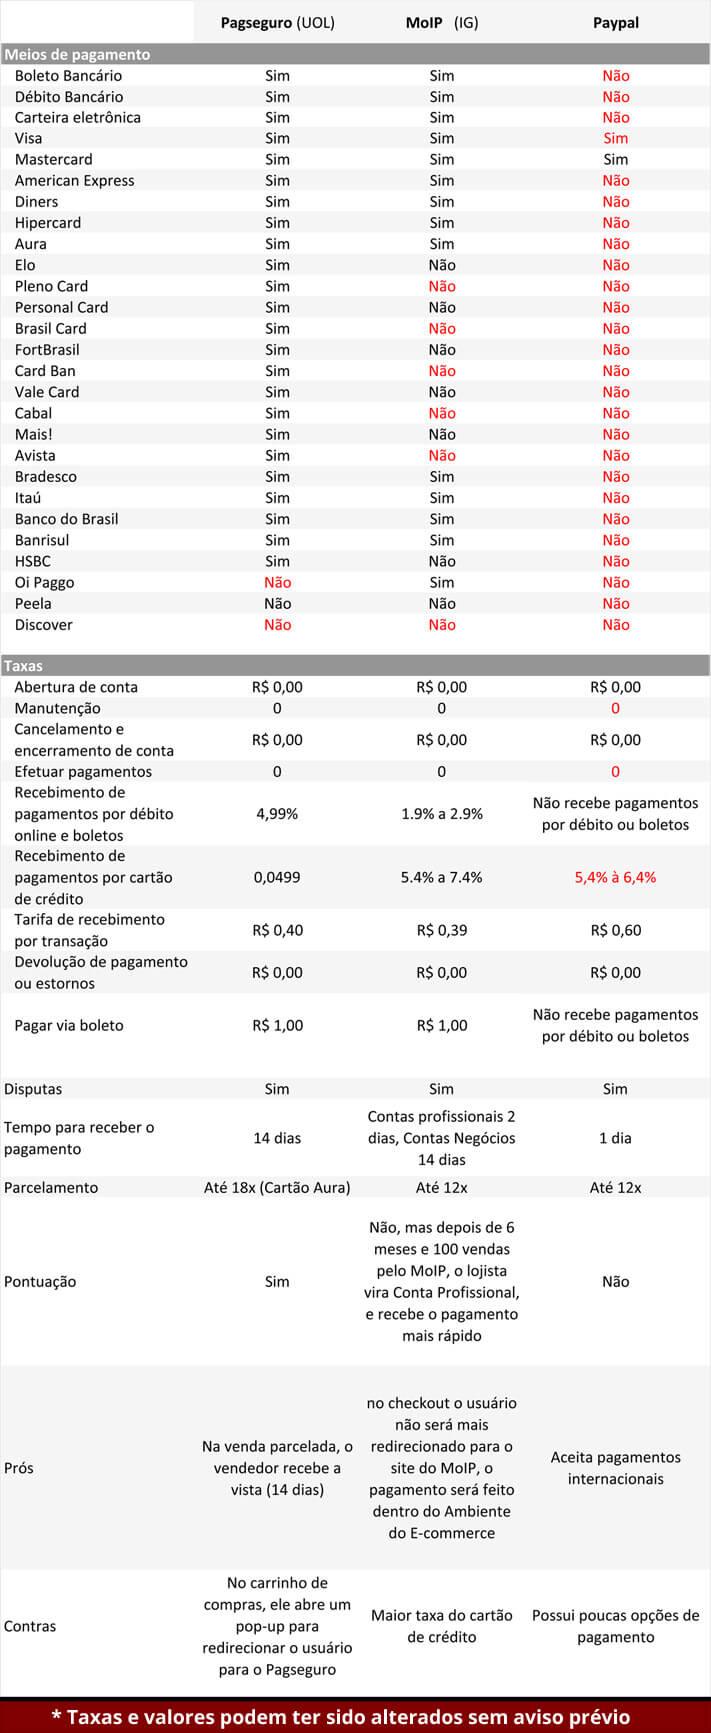 comparacao_meiosdepagamento_2013-1